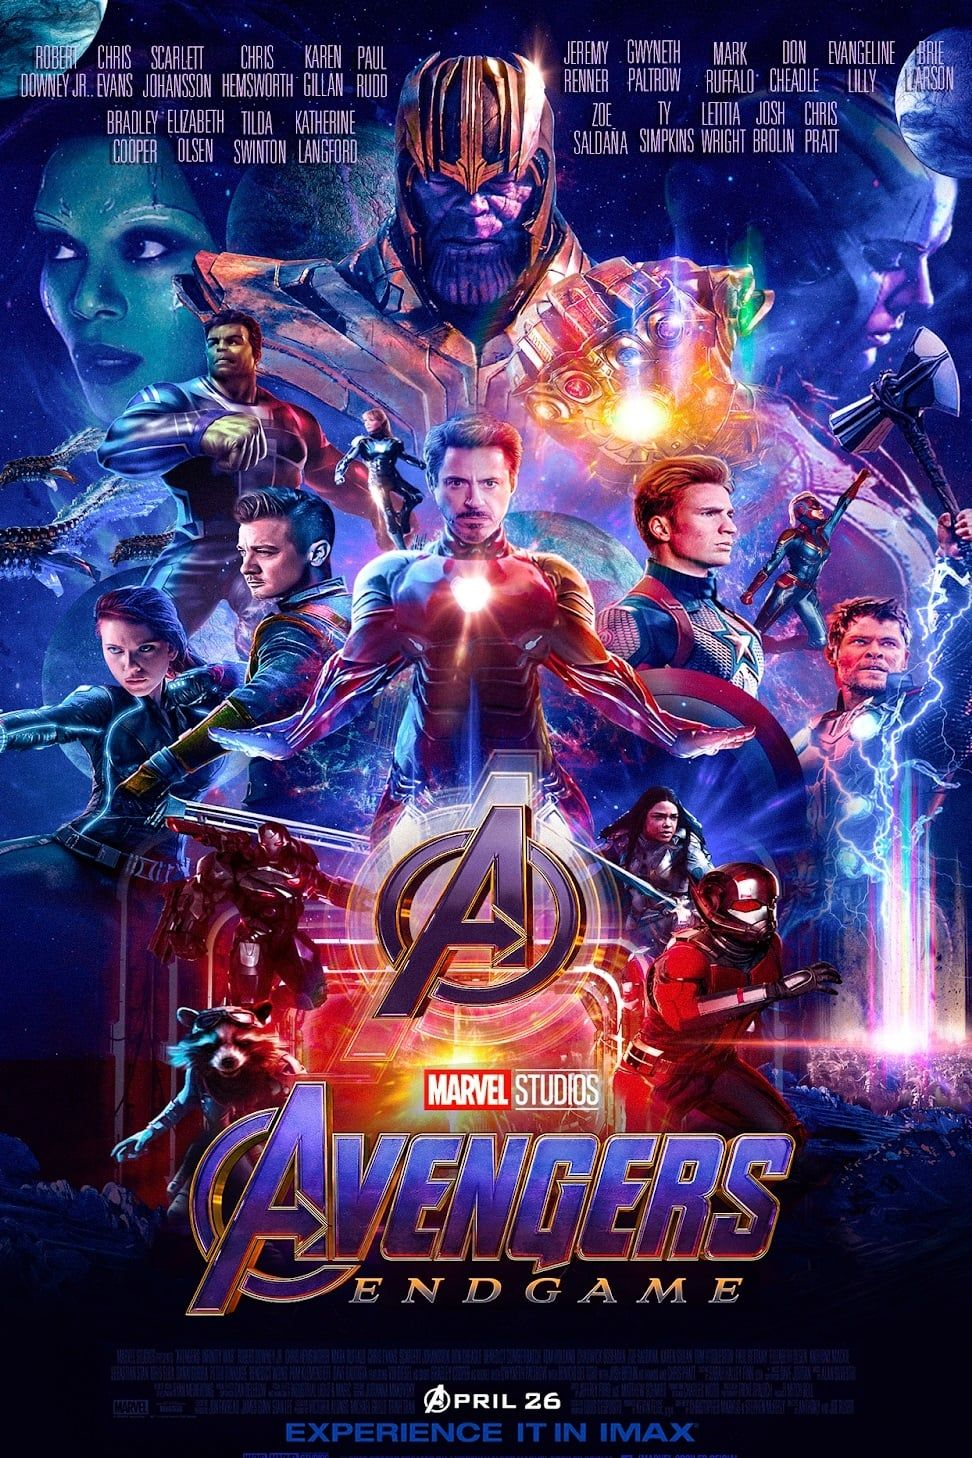 peliculas online gratis hd latino avengers infinity war